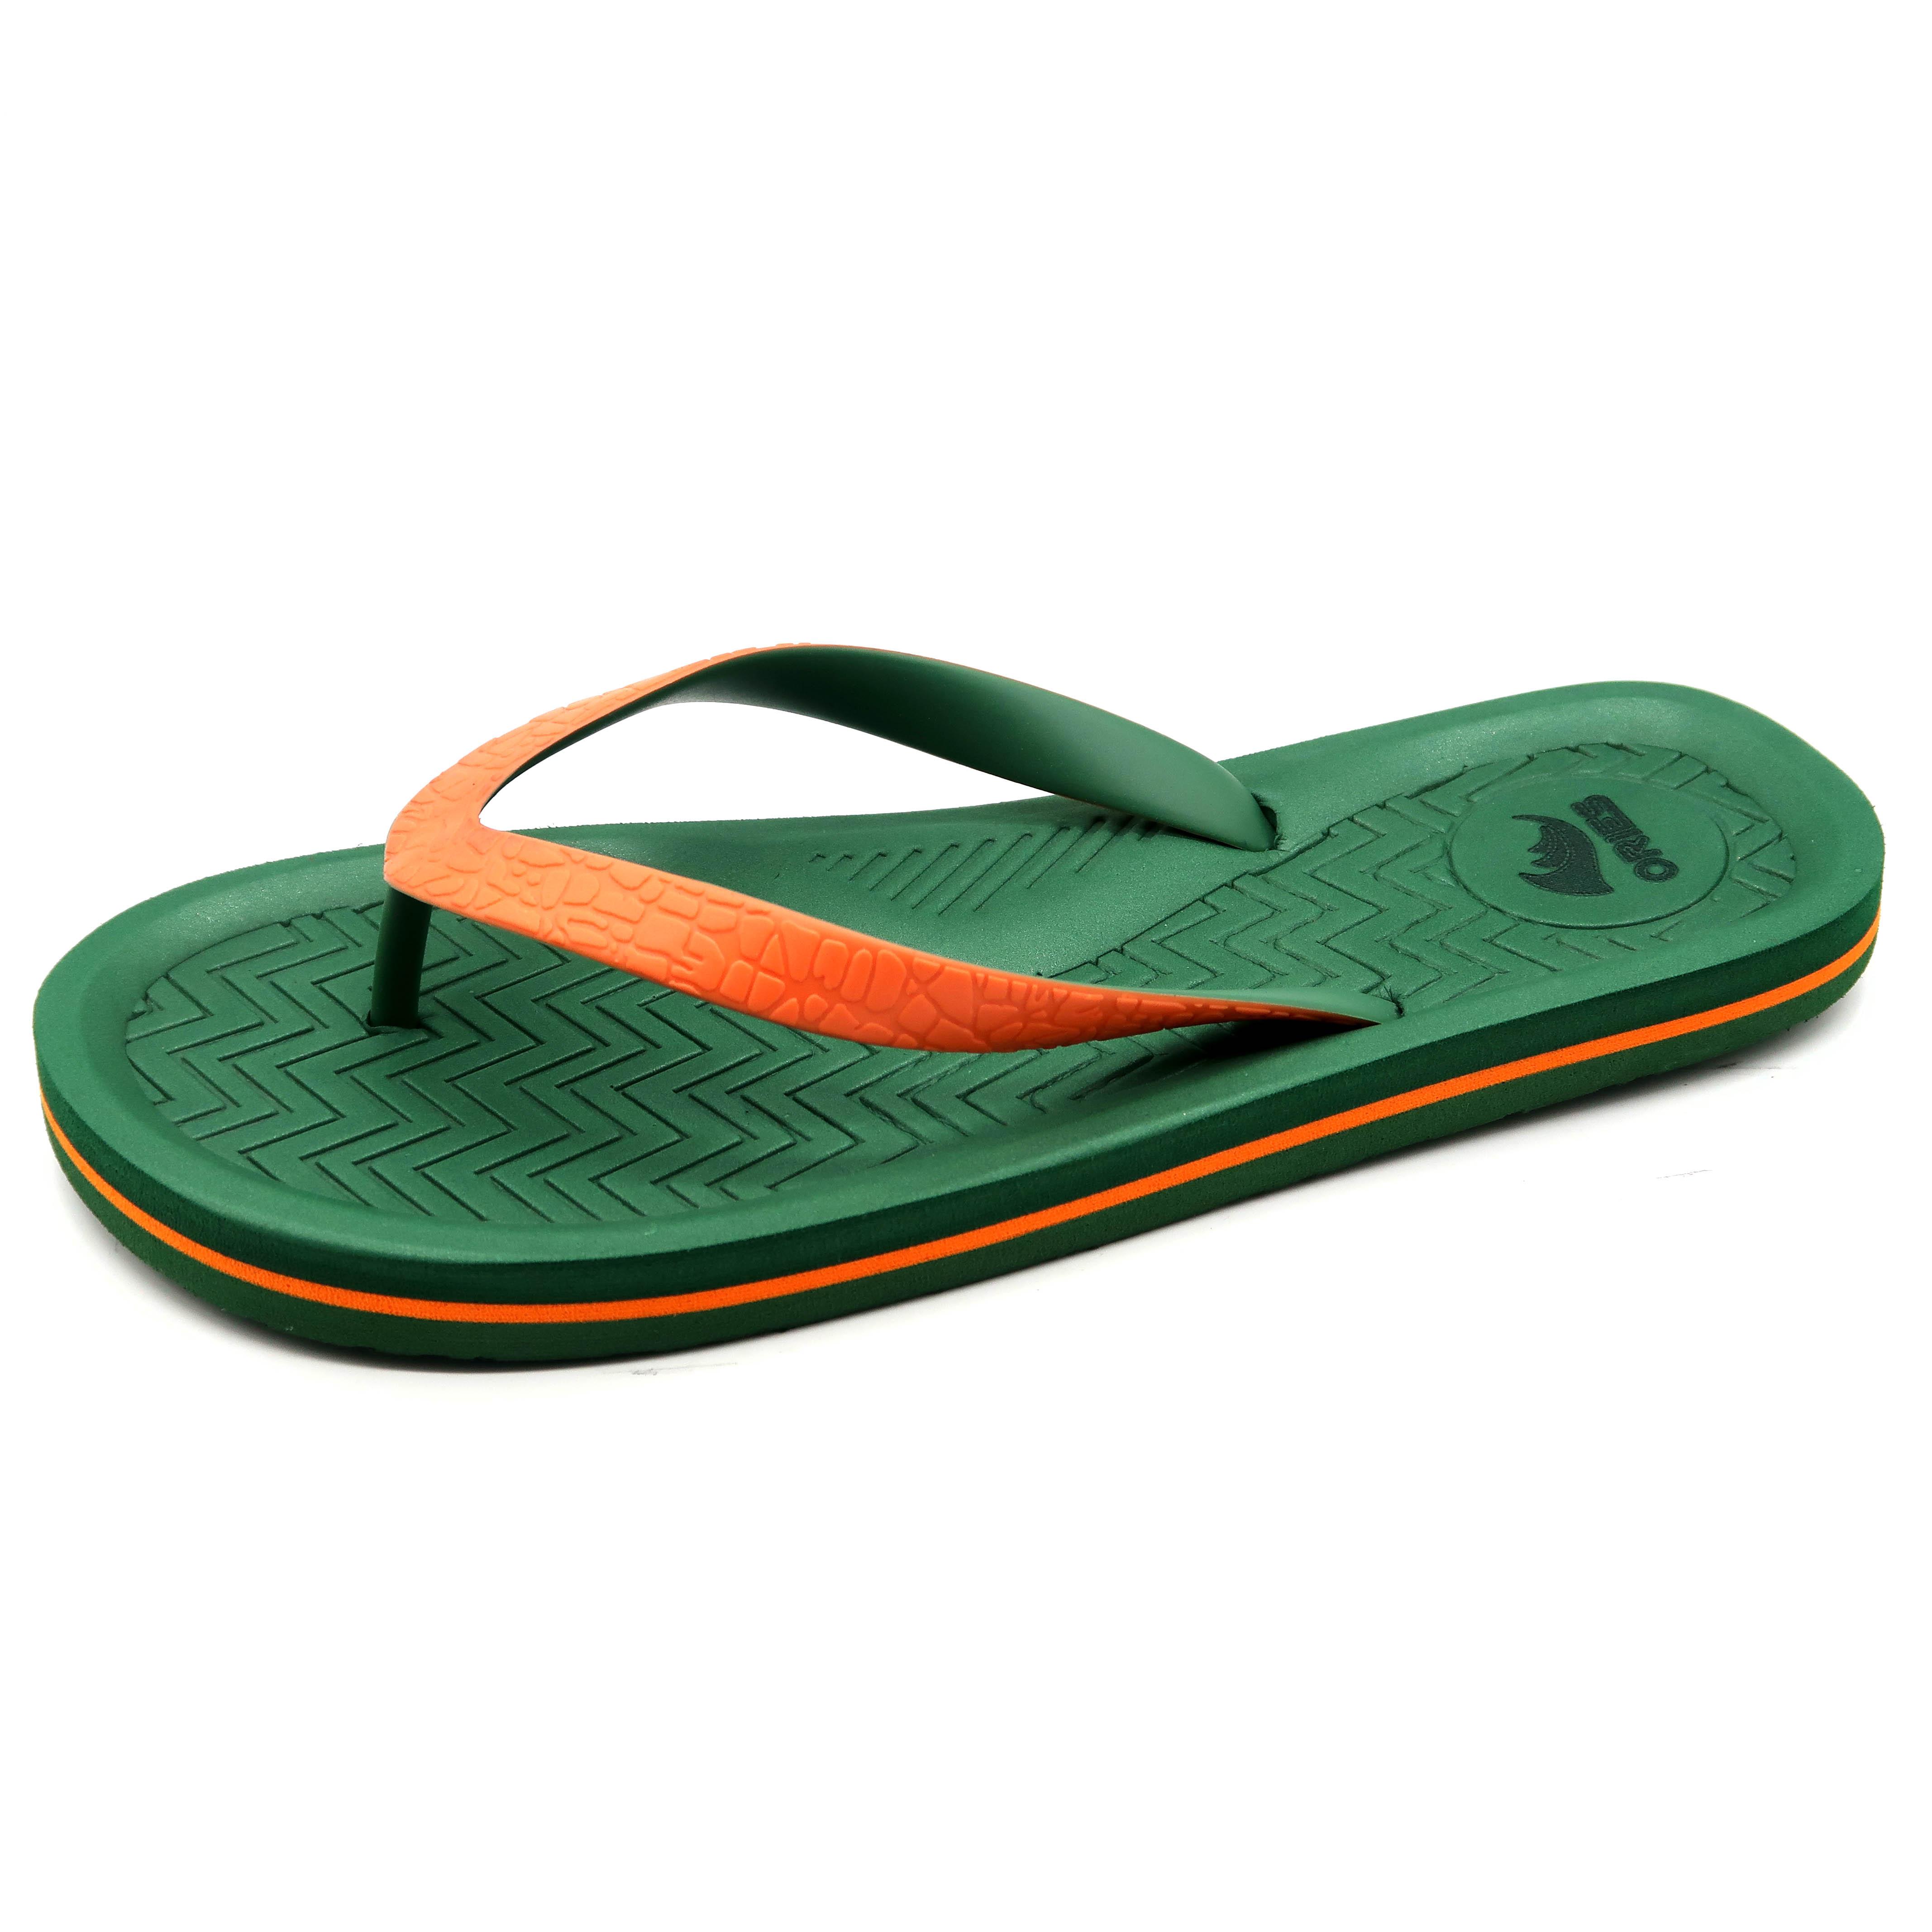 d2ea11650c6d China men strap slipper wholesale 🇨🇳 - Alibaba